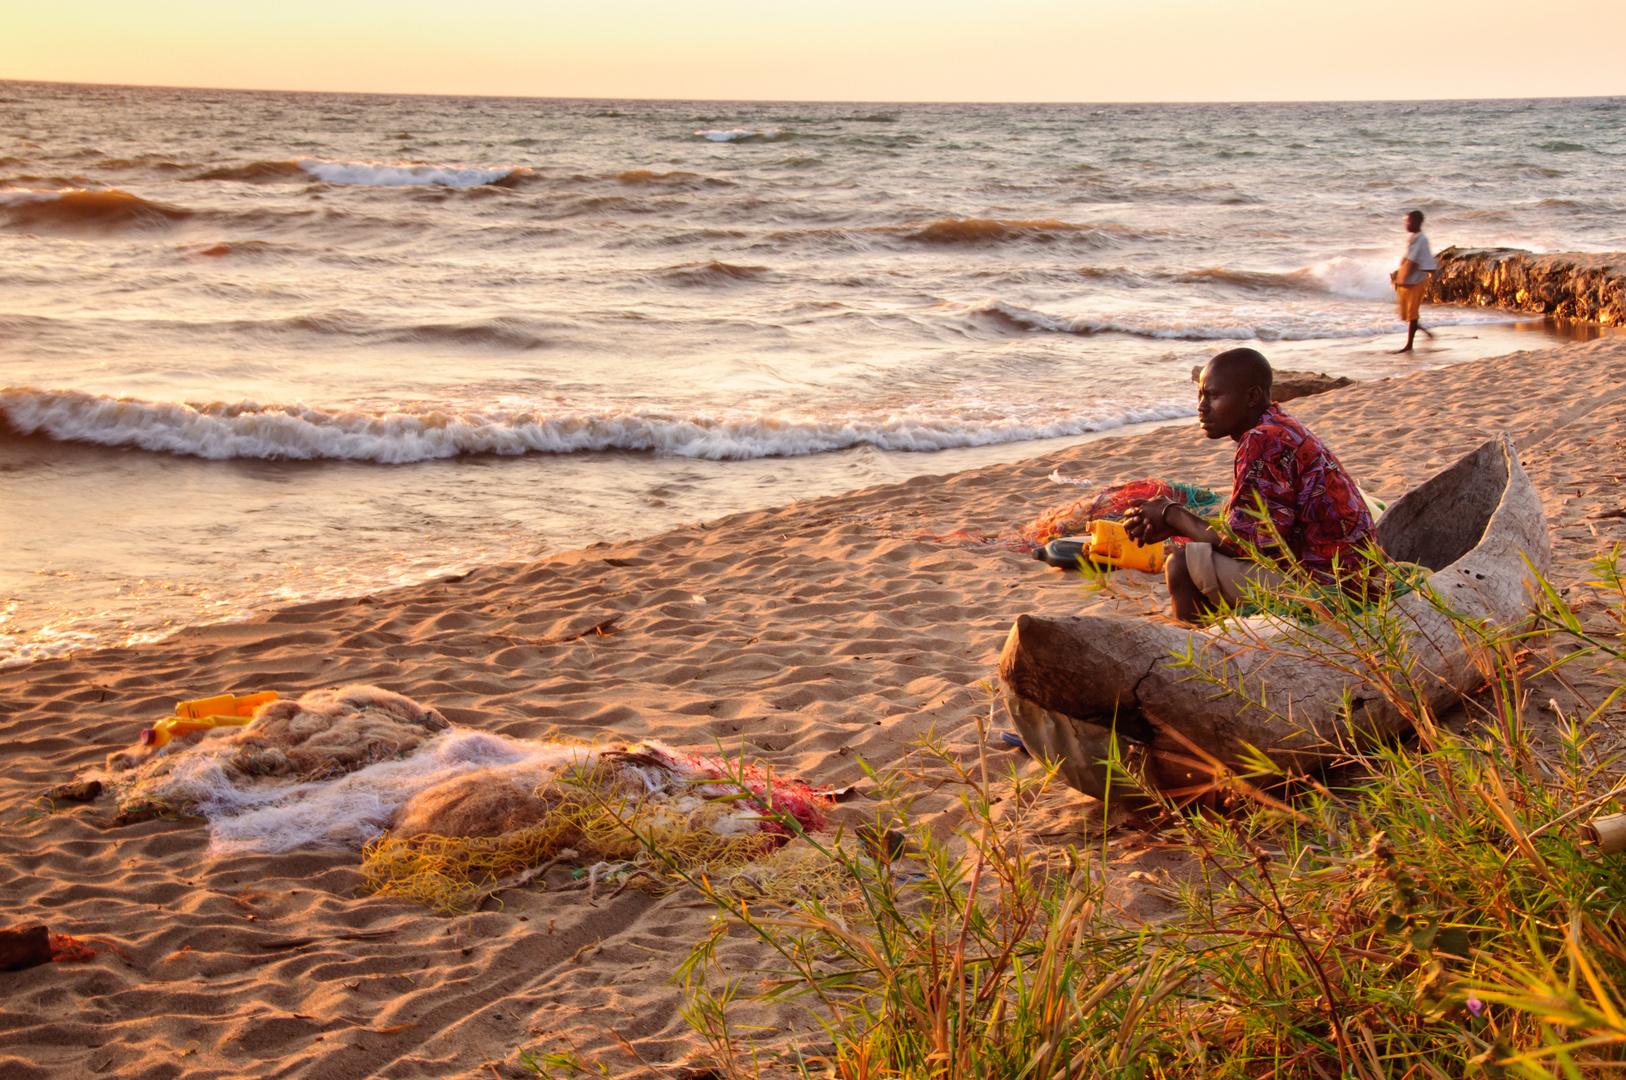 Am Malawisee am Morgen